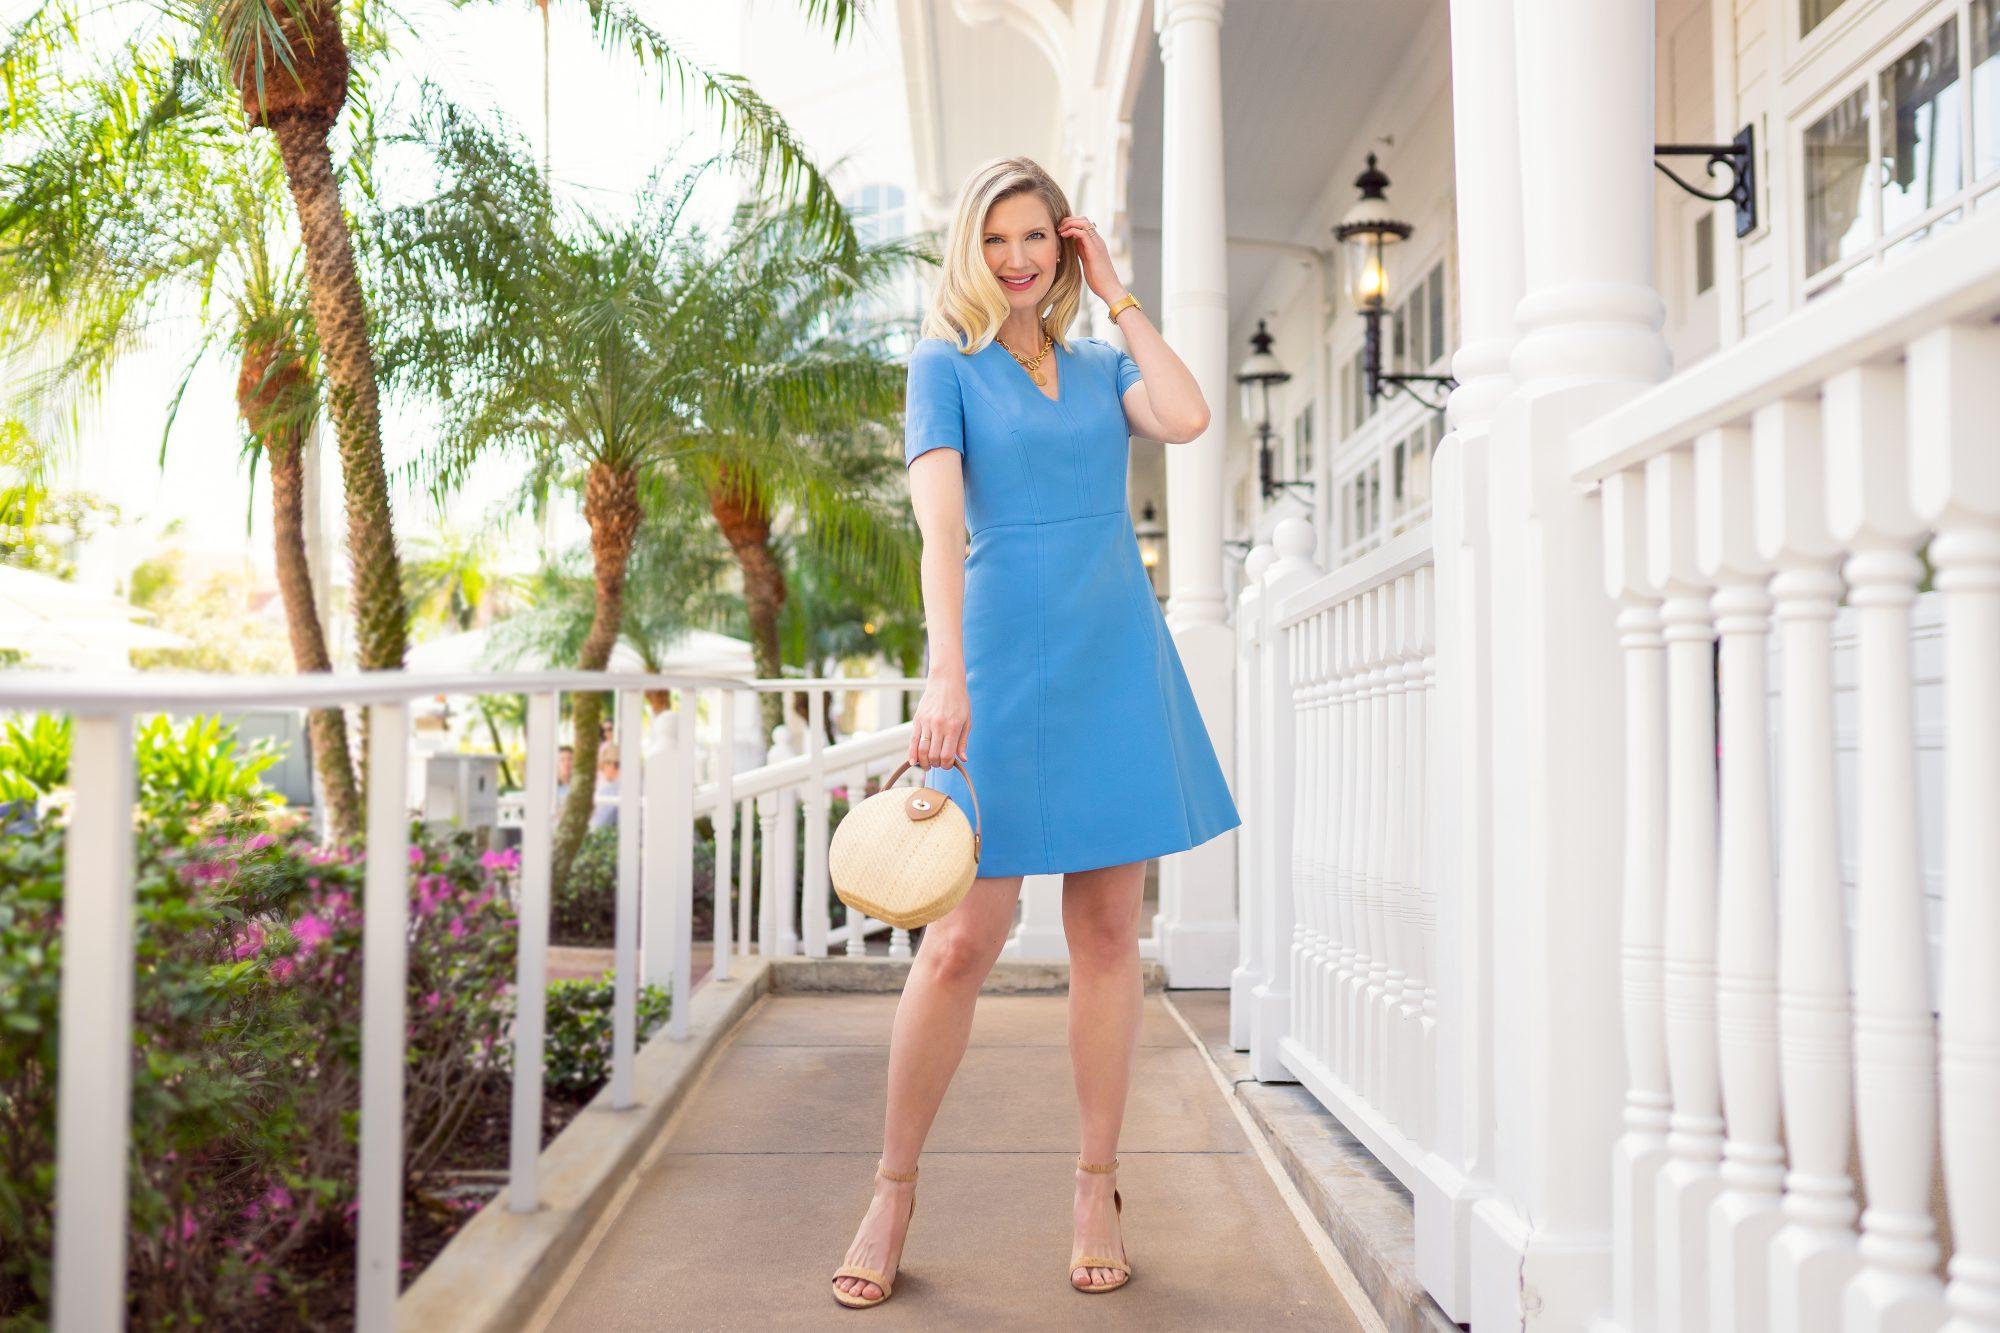 Ashley Brooke in Blue Dress from Halsbrook on www.ashleybrookedesigns.com